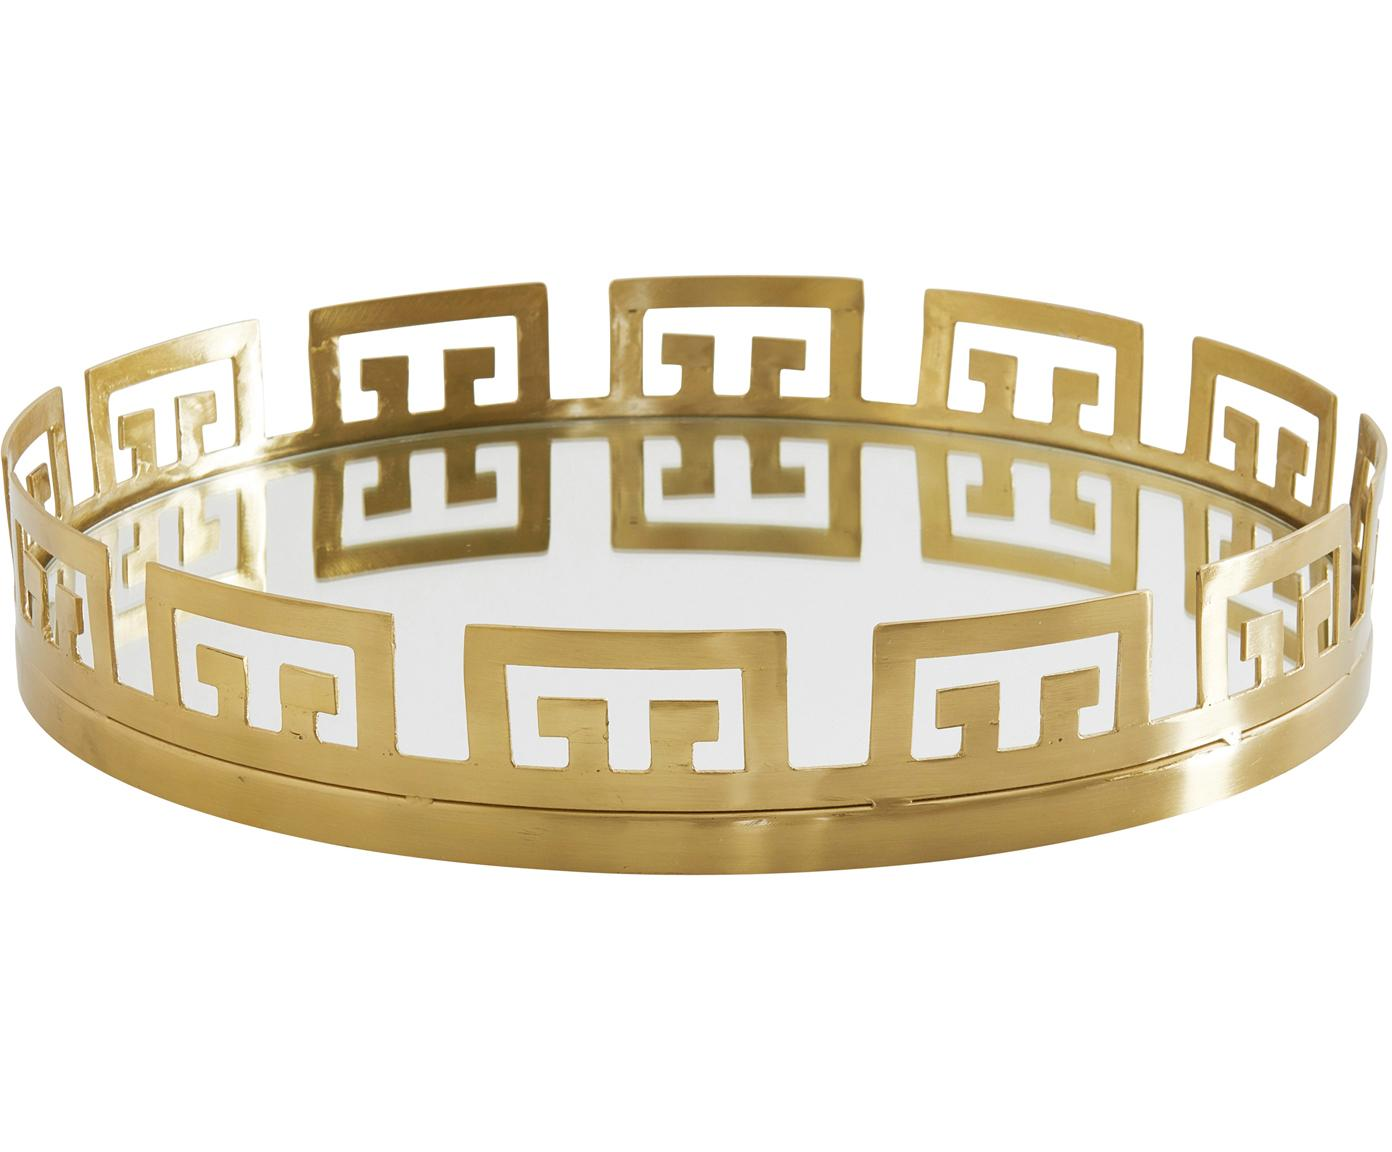 Dienblad Mallis, Metaal, spiegelglas, Goudkleurig, spiegelglas, Ø 42 cm